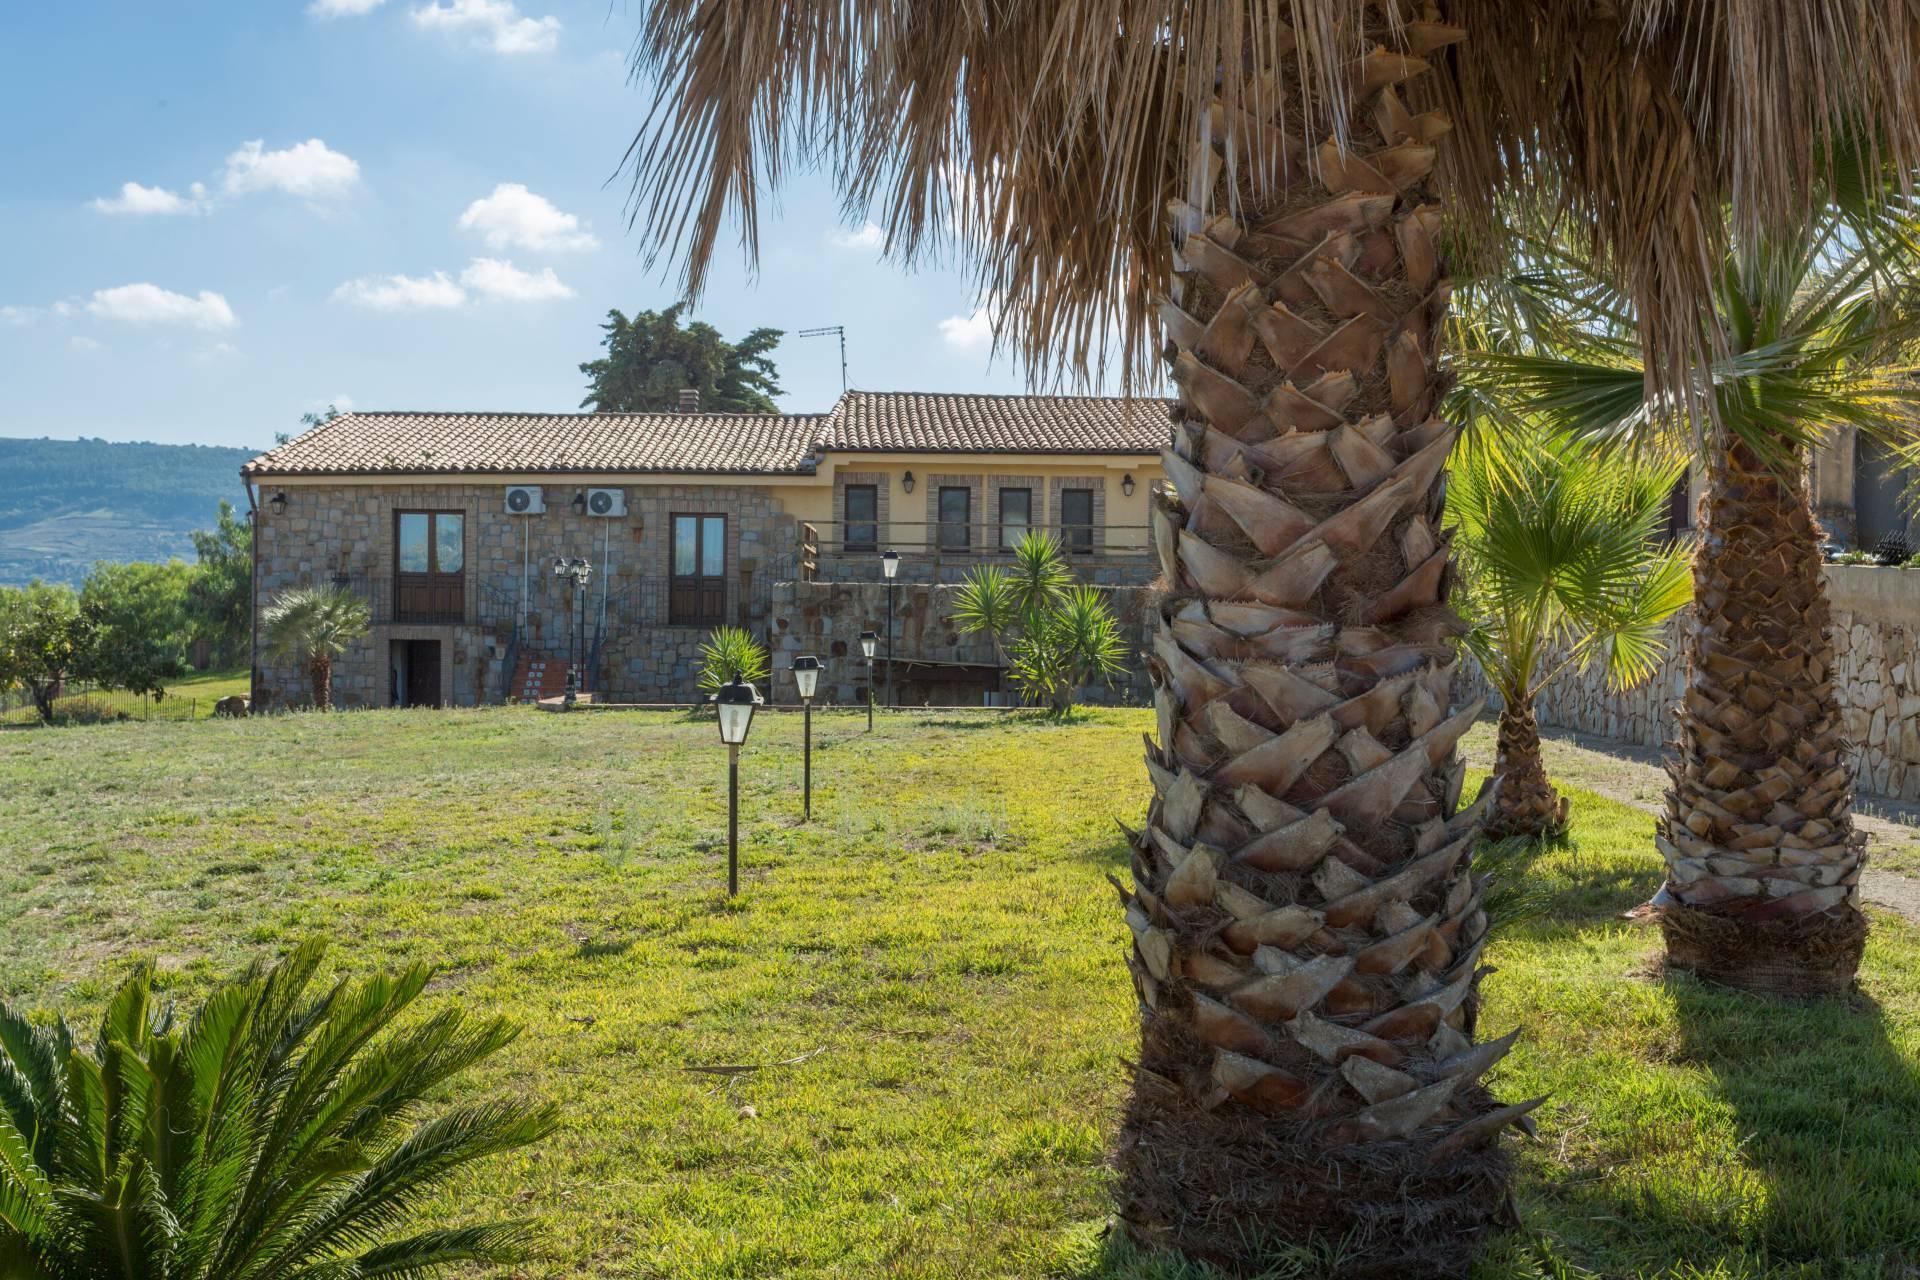 Villa in Vendita a Piazza Armerina: 5 locali, 550 mq - Foto 5